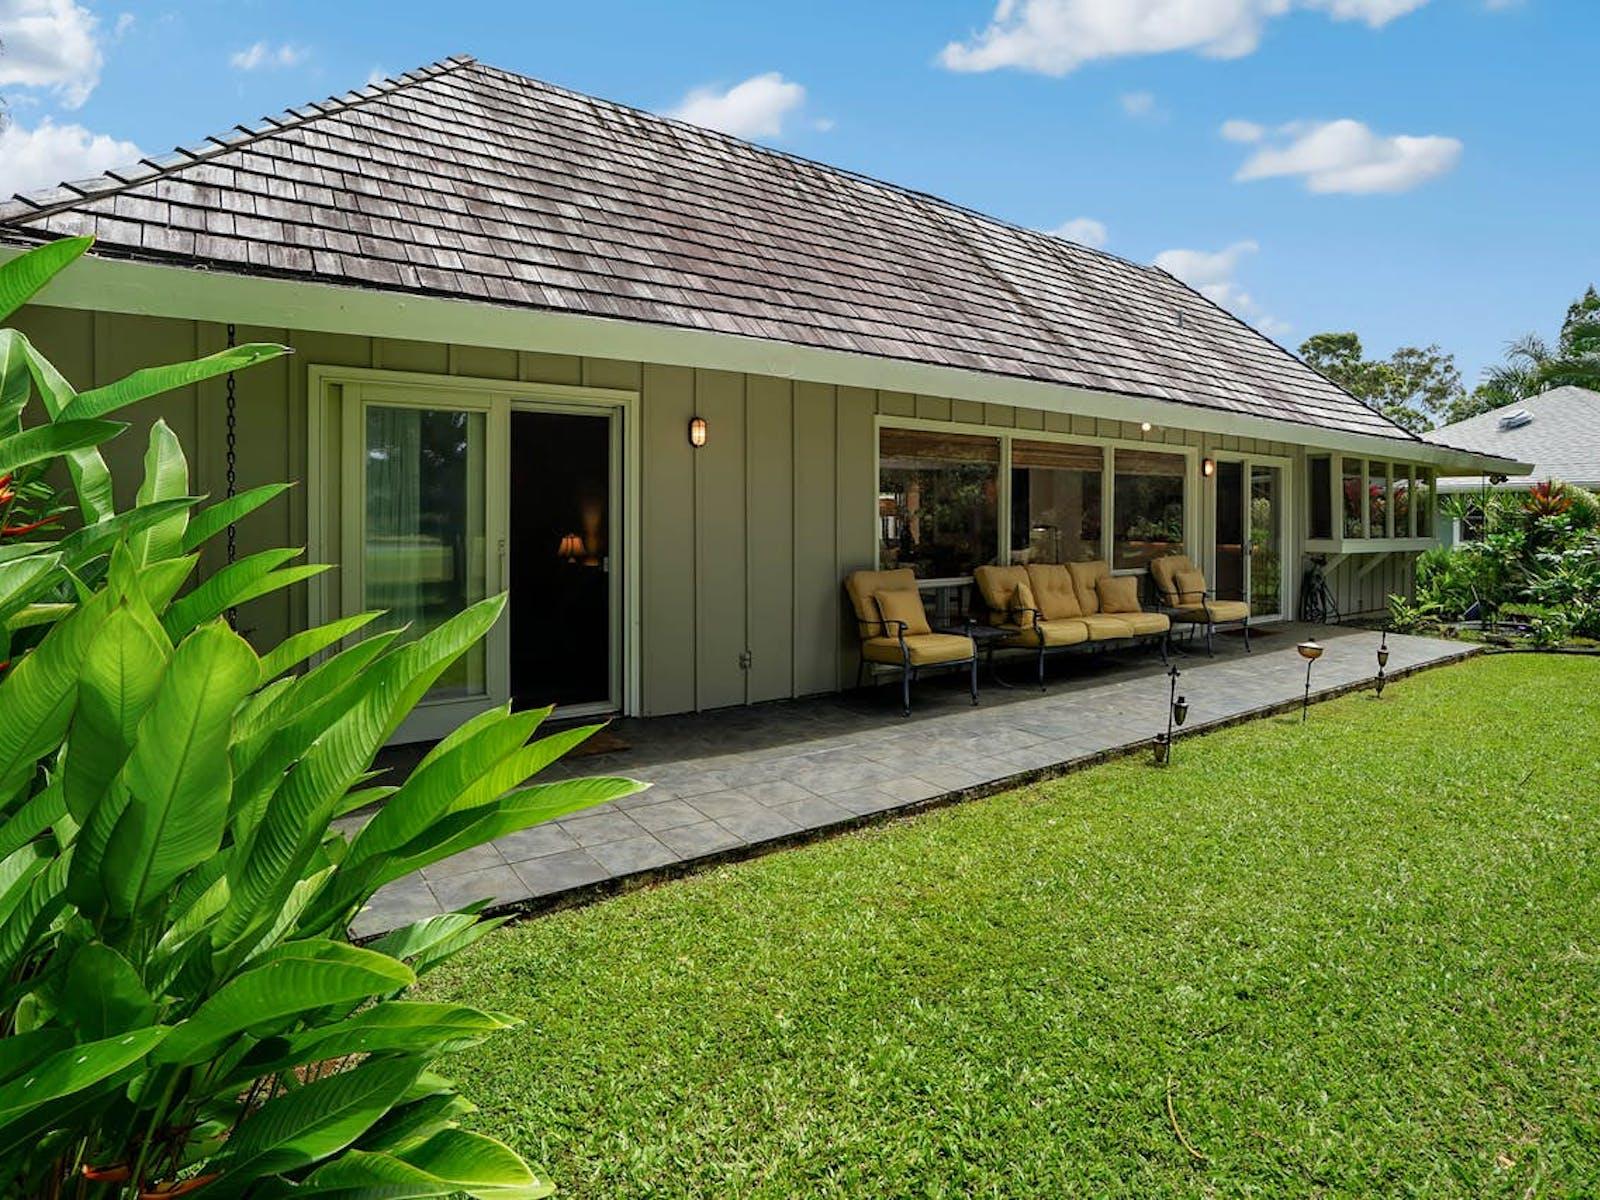 vacation home in kauai, hi